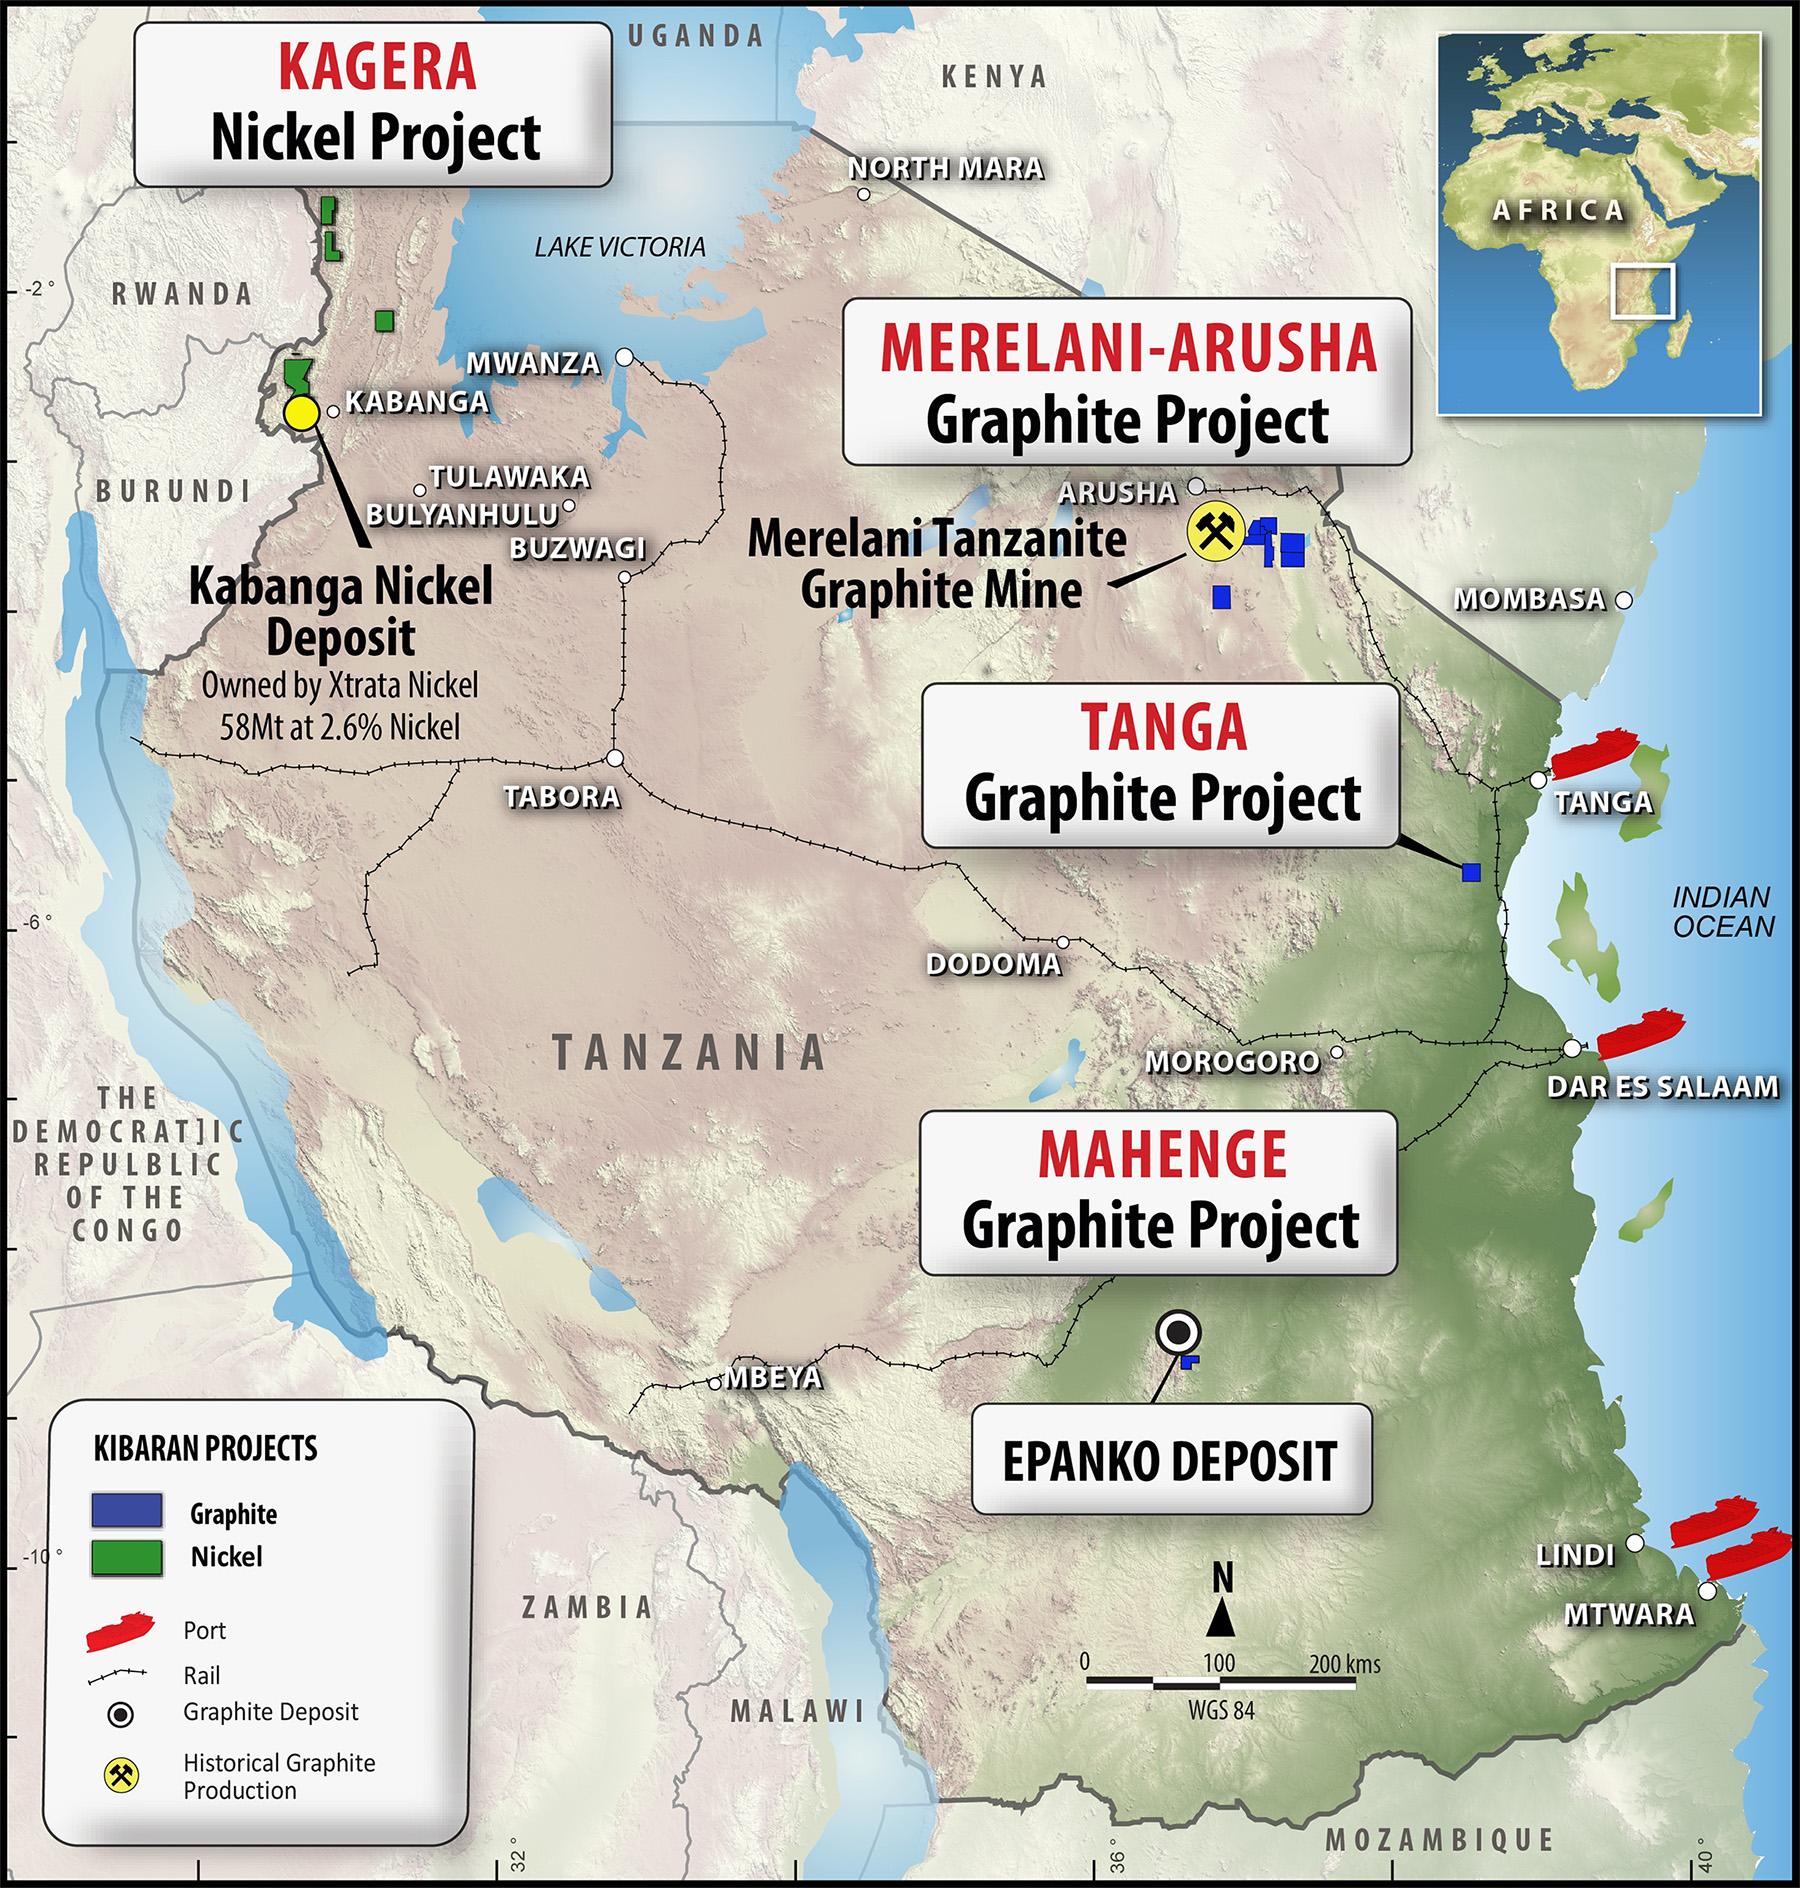 Kibaran Resources issues Epanko Graphite Project update